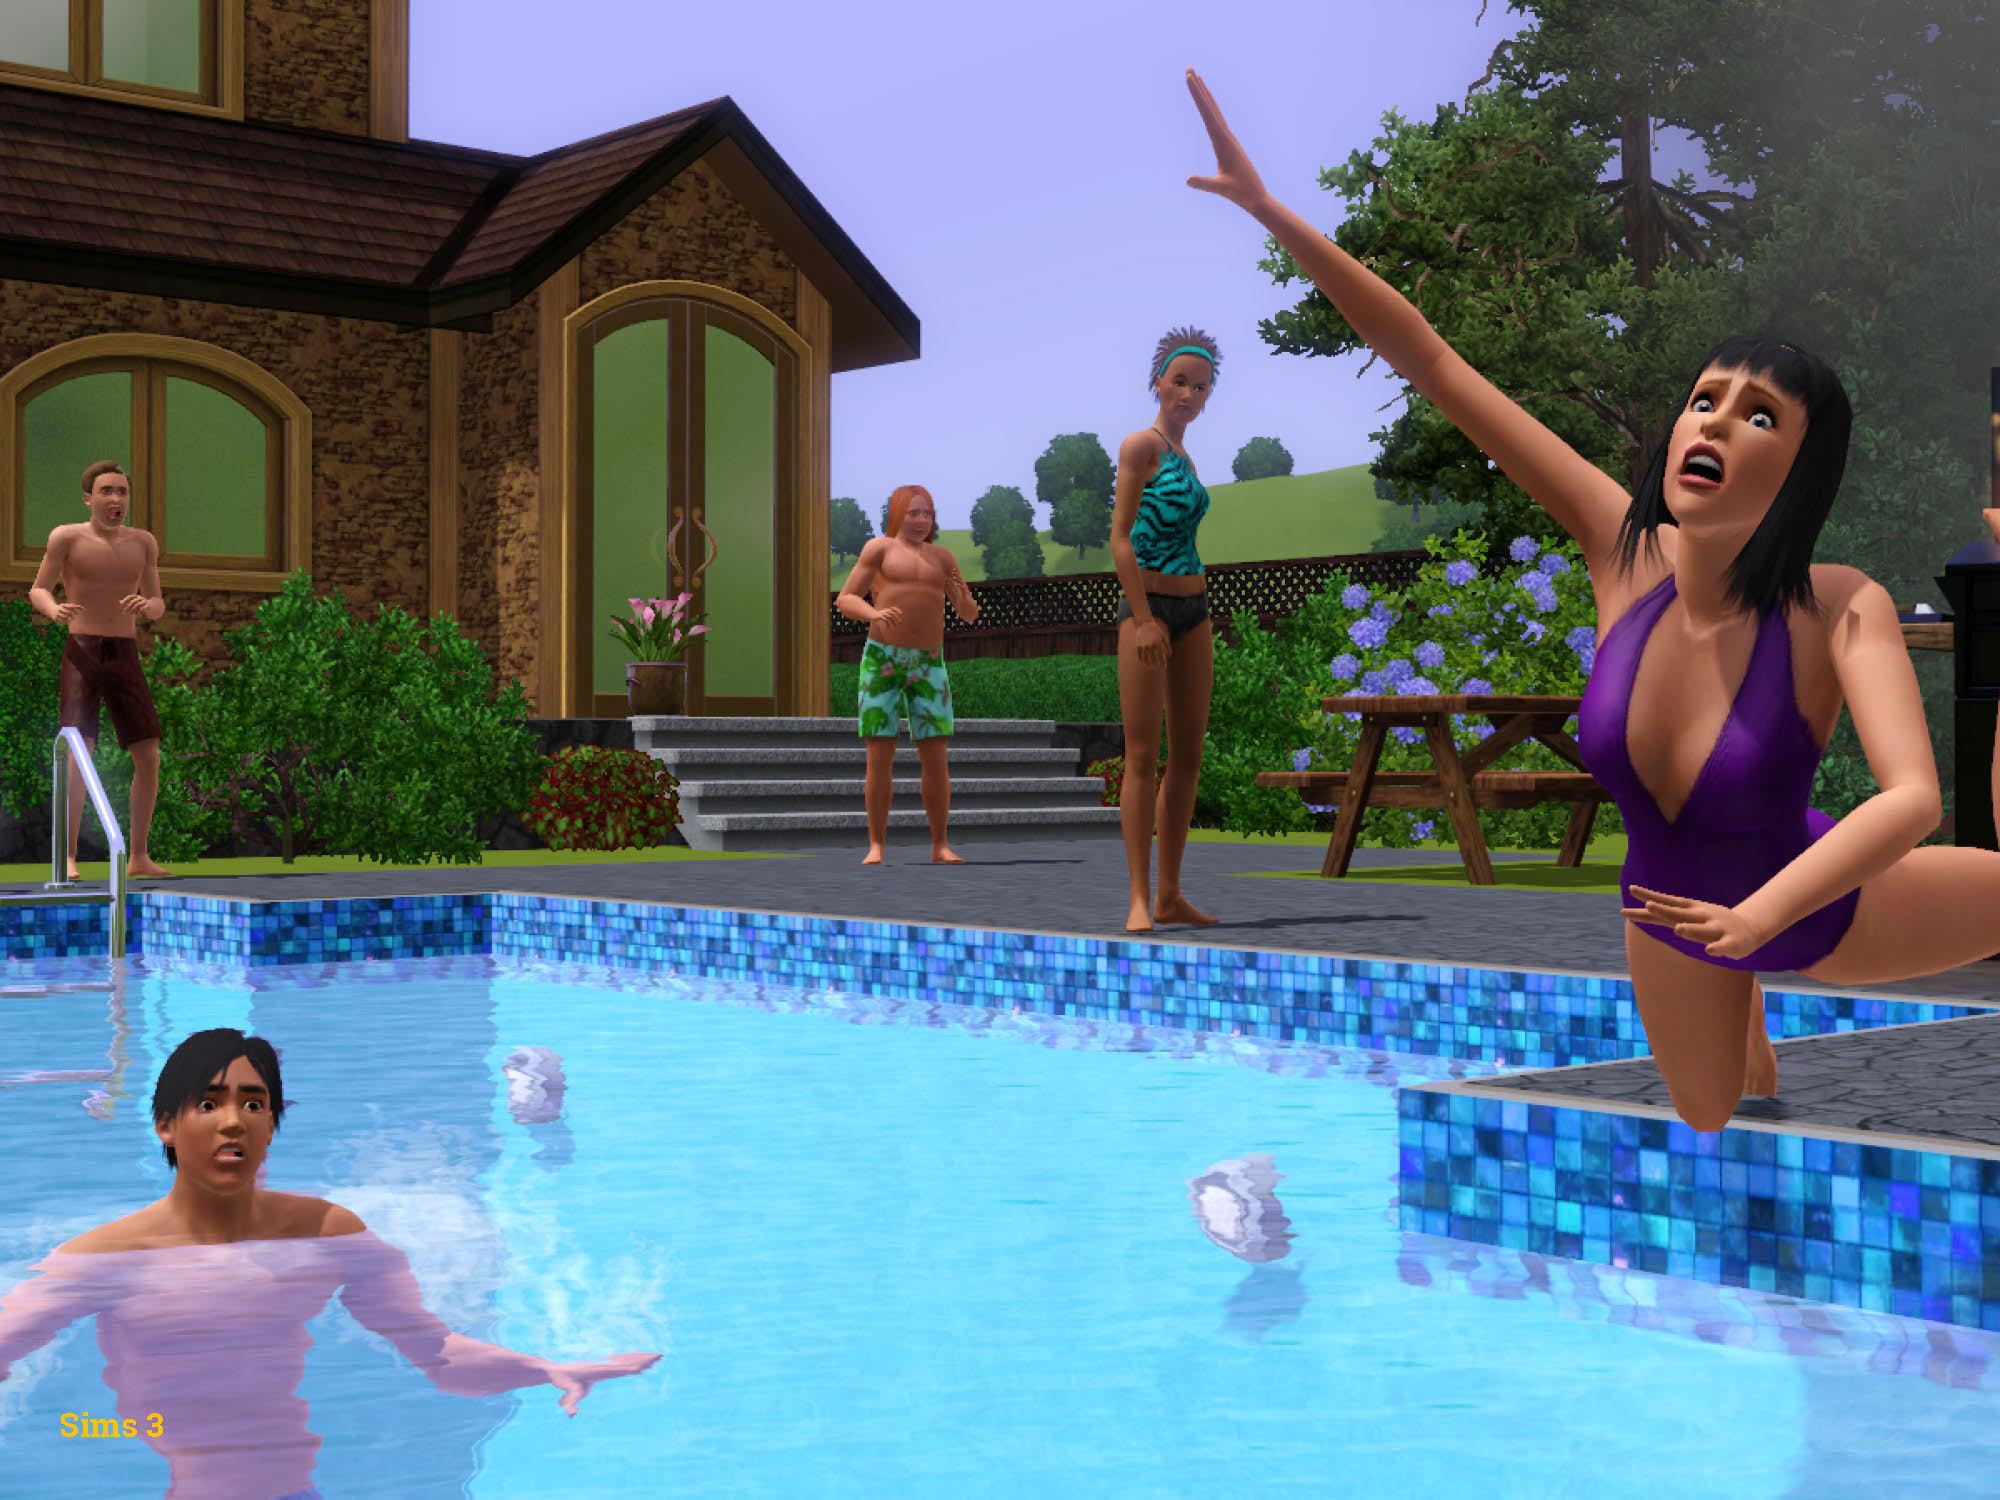 Screenshot aus dem Spiel Sims 3